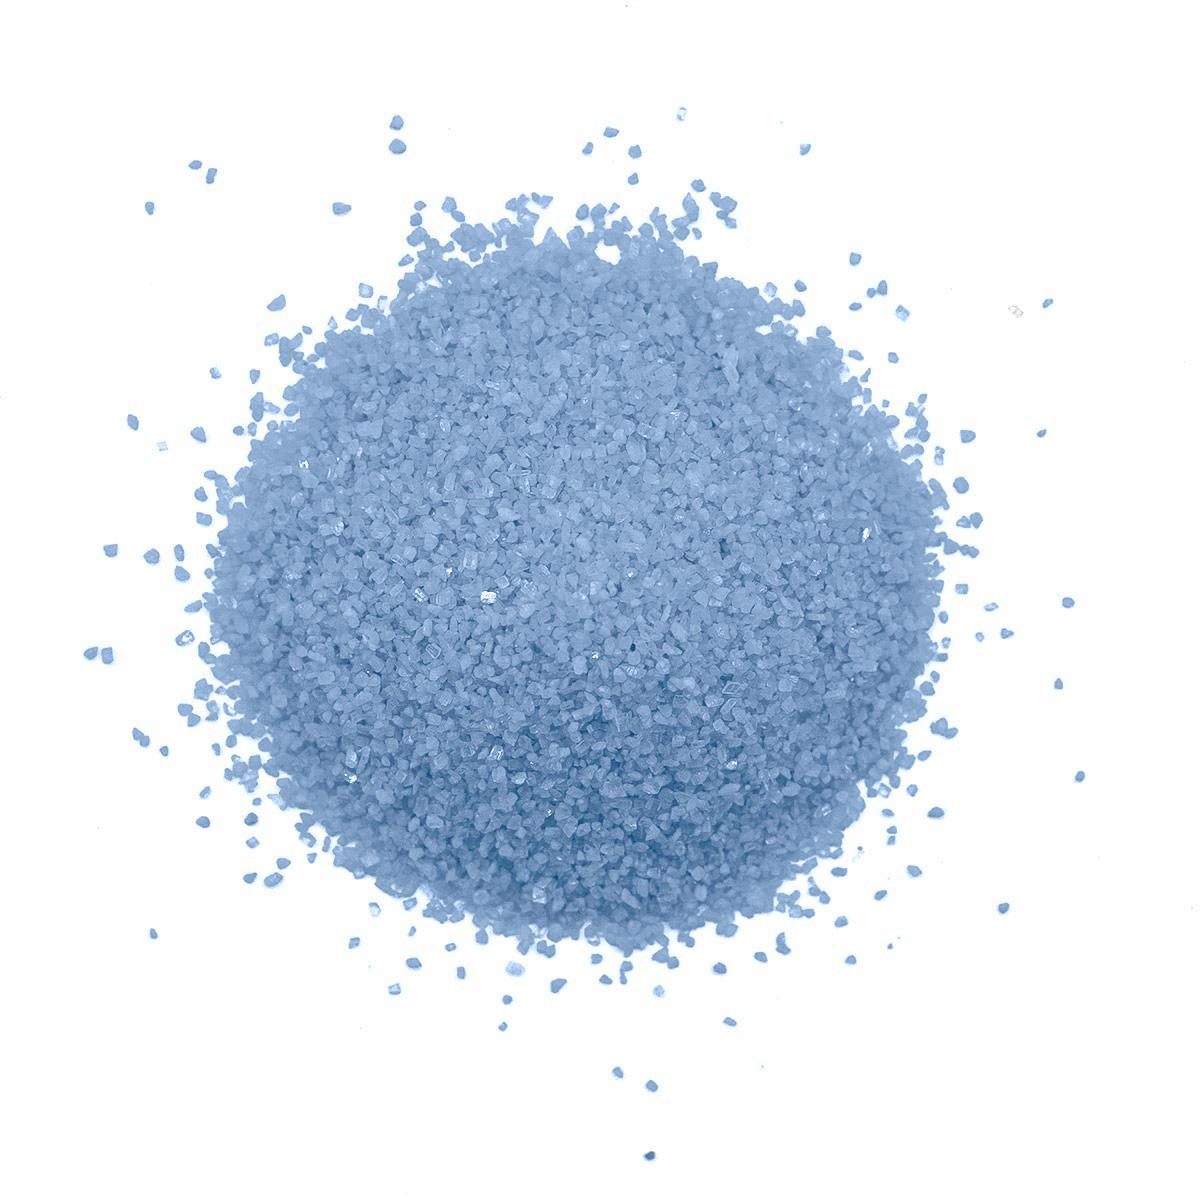 Песок для декор. работ (500гр.) (131 синий) фото